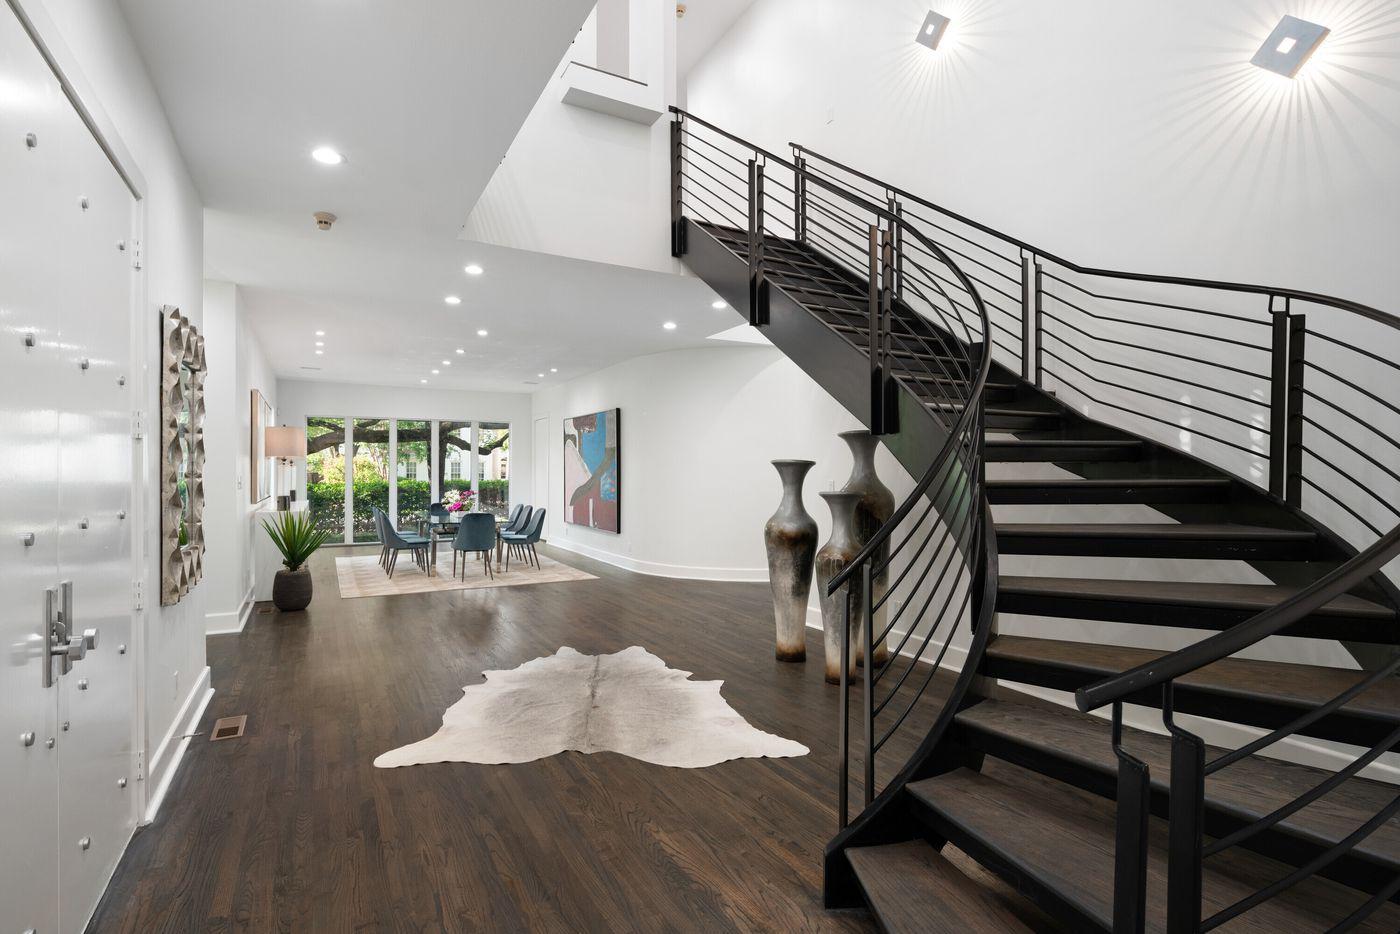 Take a look at the home at 9900 Preston Road in Dallas.